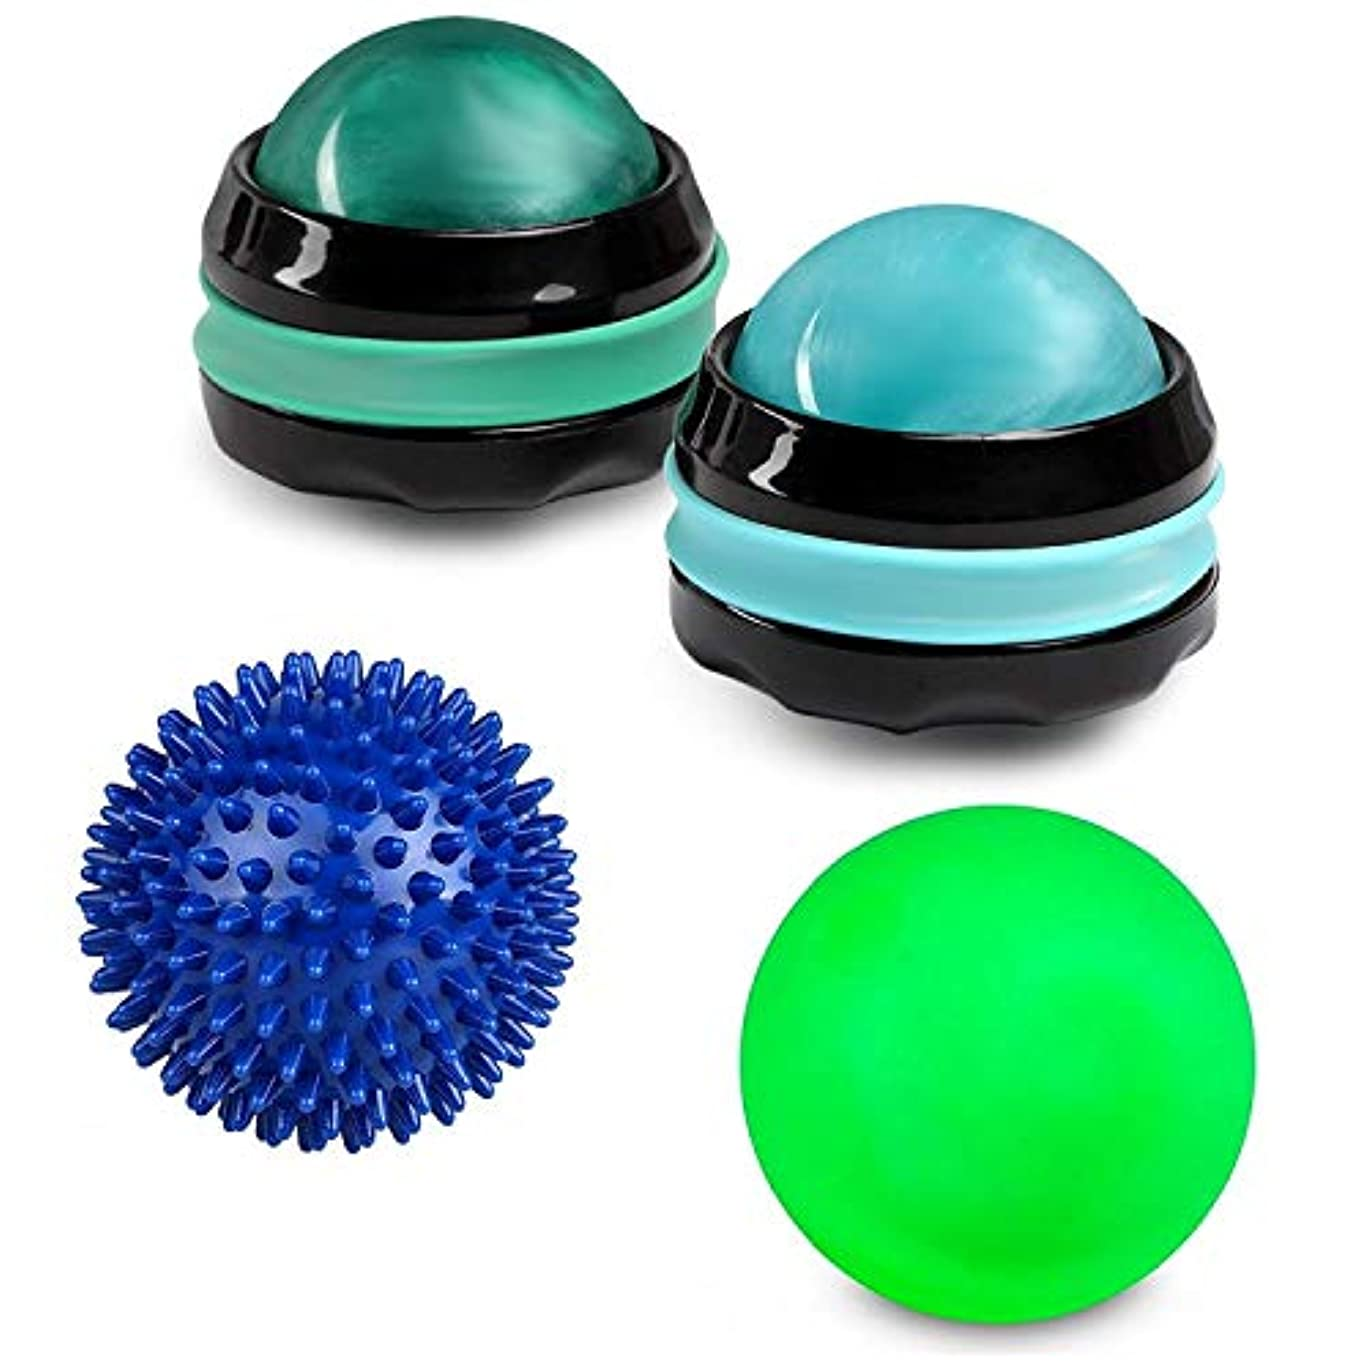 Massage Ball Set - Foot Body Back Leg Neck Hand Rejuvenation Therapy Roller Massager Therapy (Bundle: 1 Lacrosse...